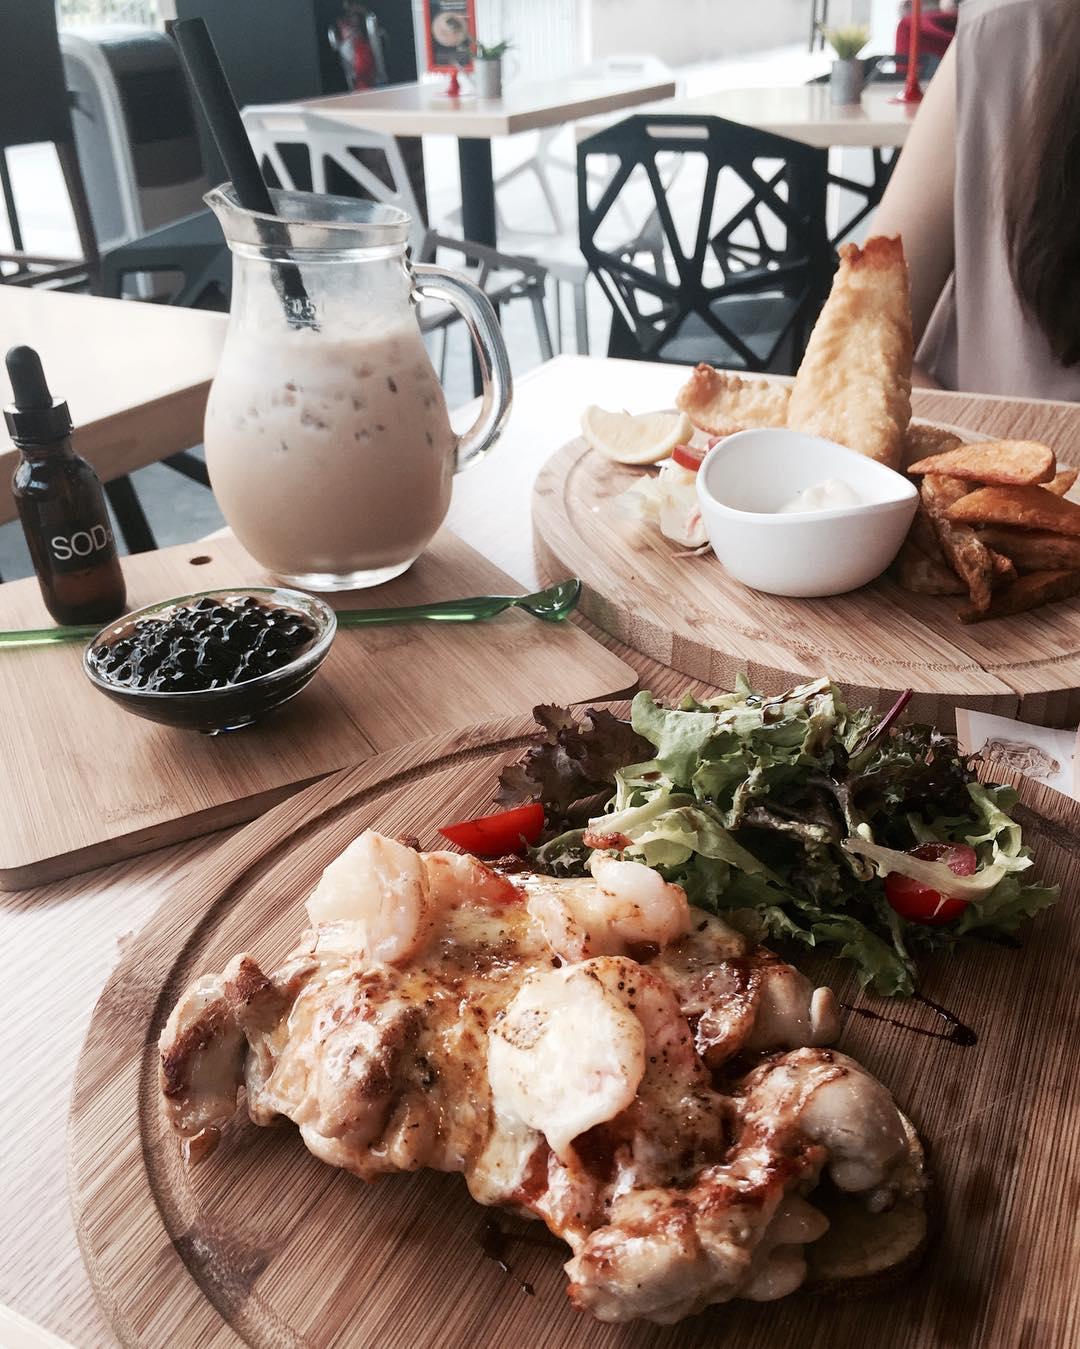 hougang food - sod cafe